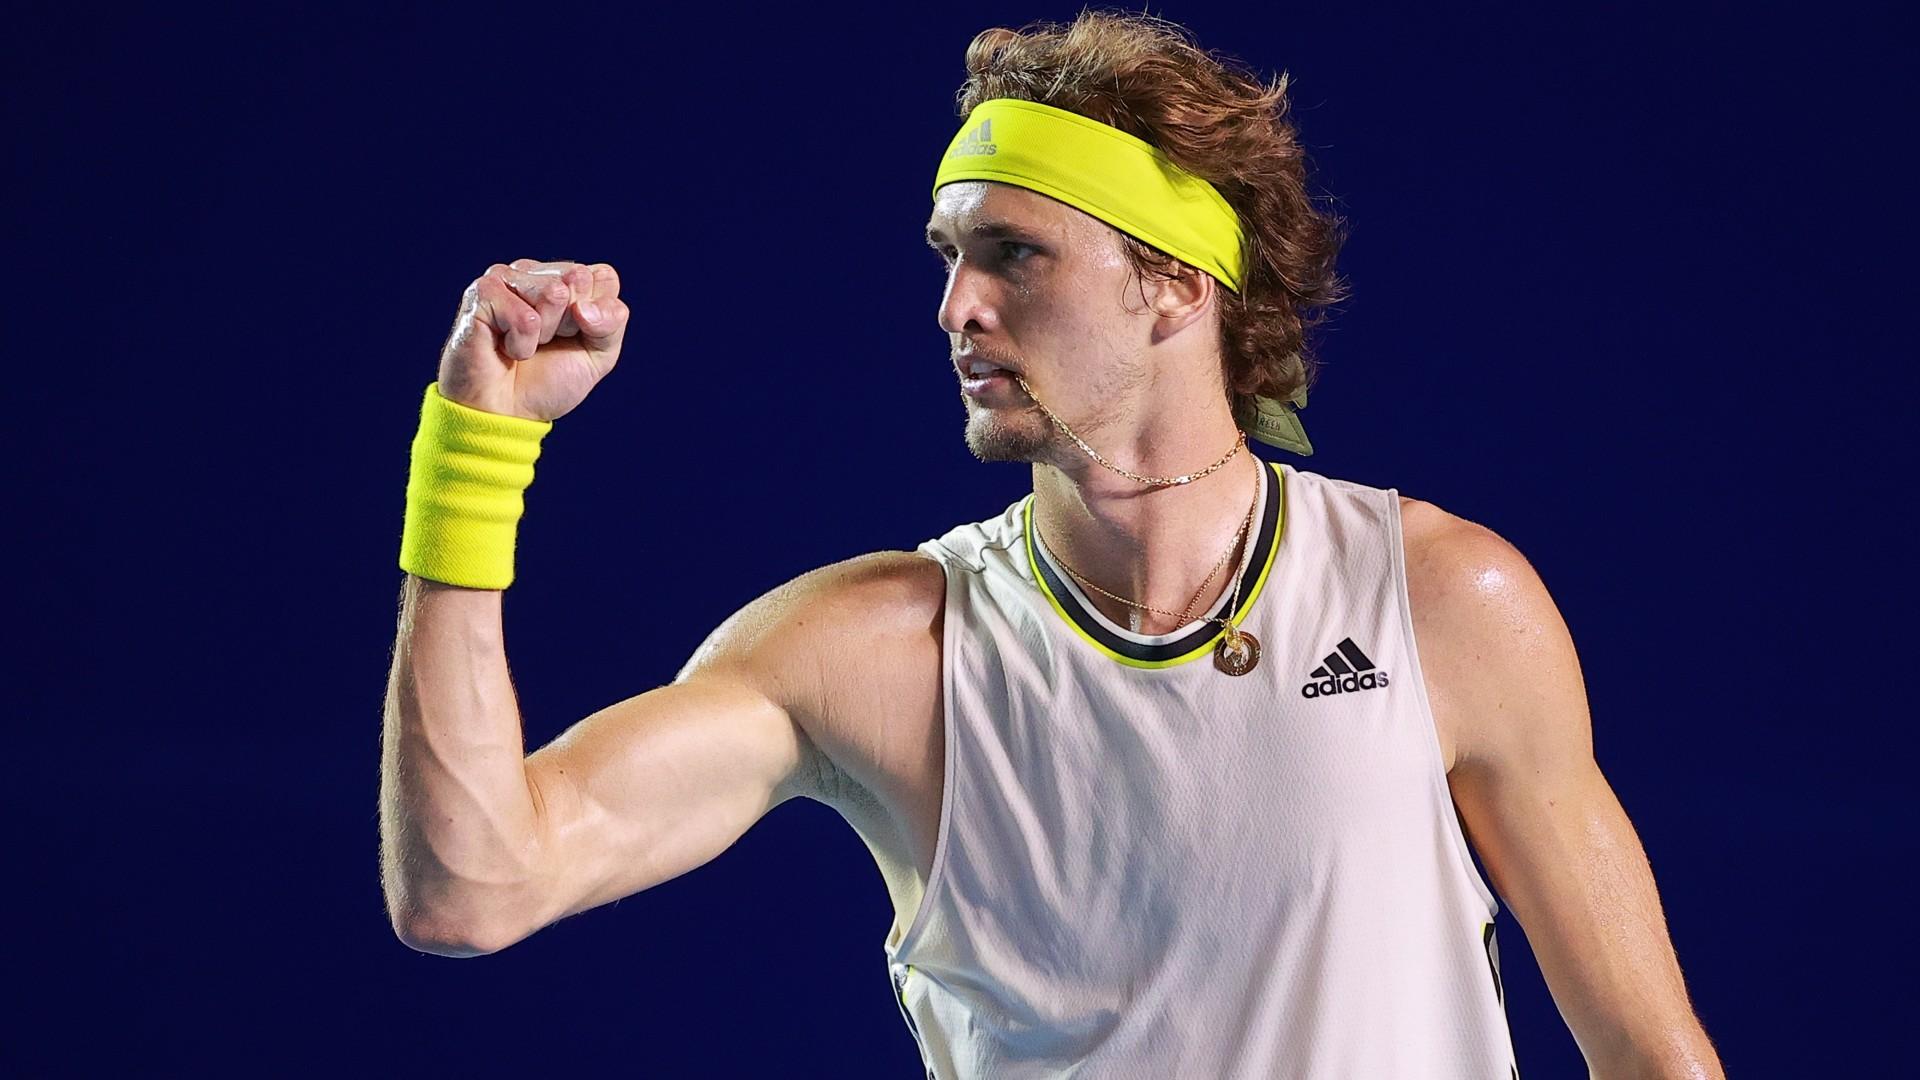 Zverev stops Tsitsipas in Acapulco for 14th ATP title